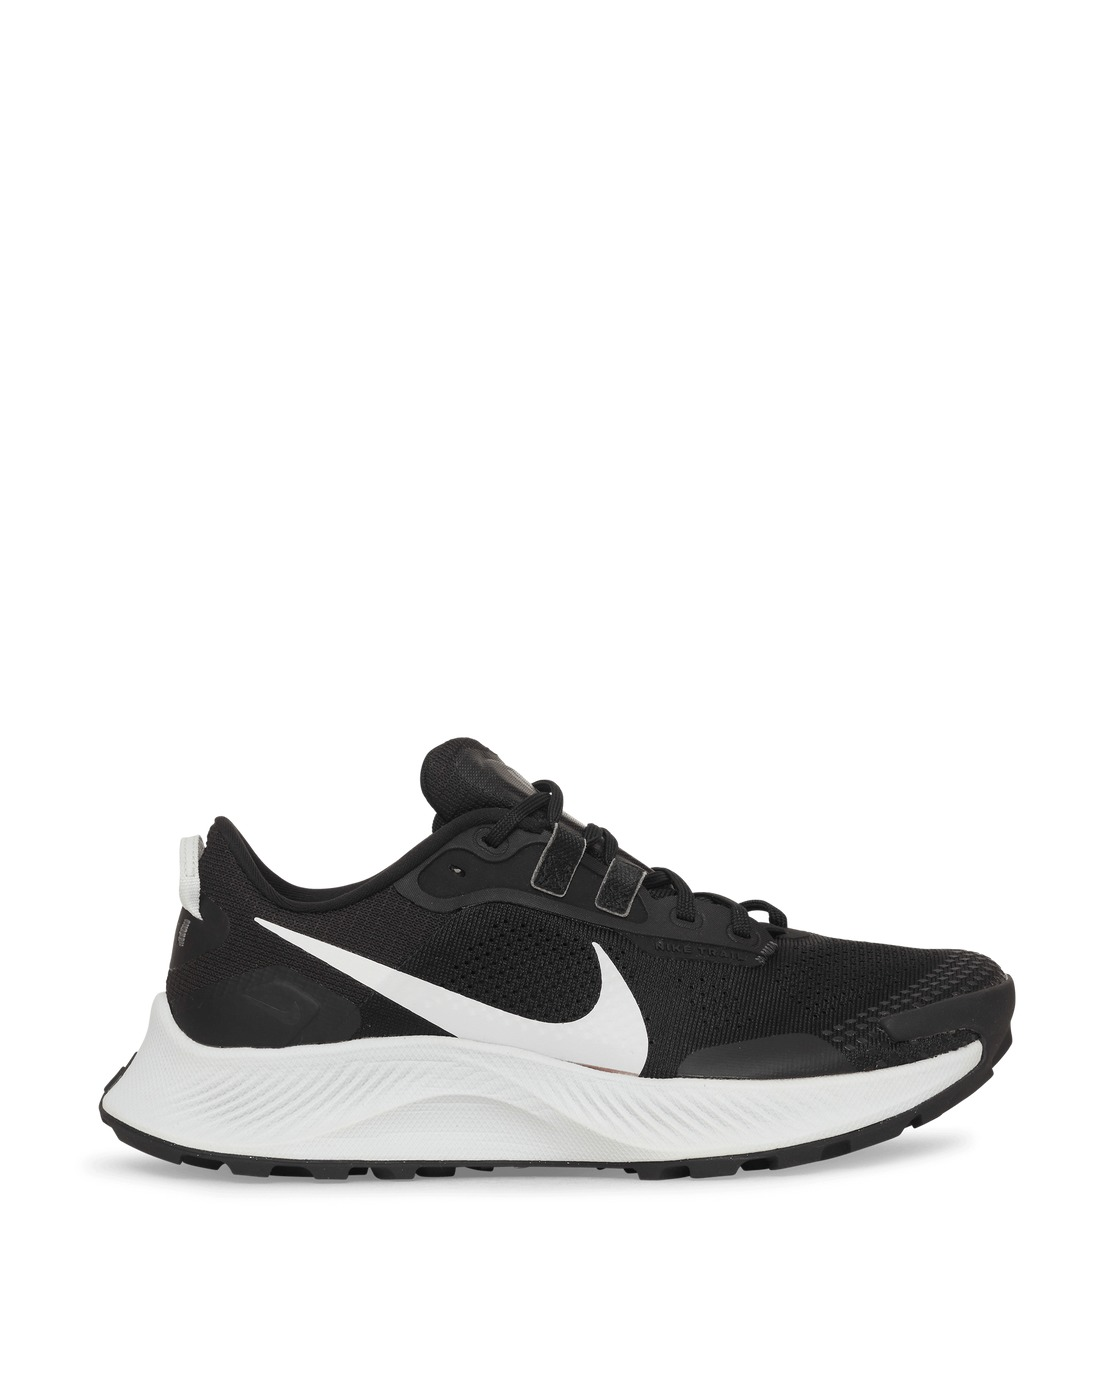 Photo: Nike Pegasus Trail 3 Sneakers Black/Pure Platinum